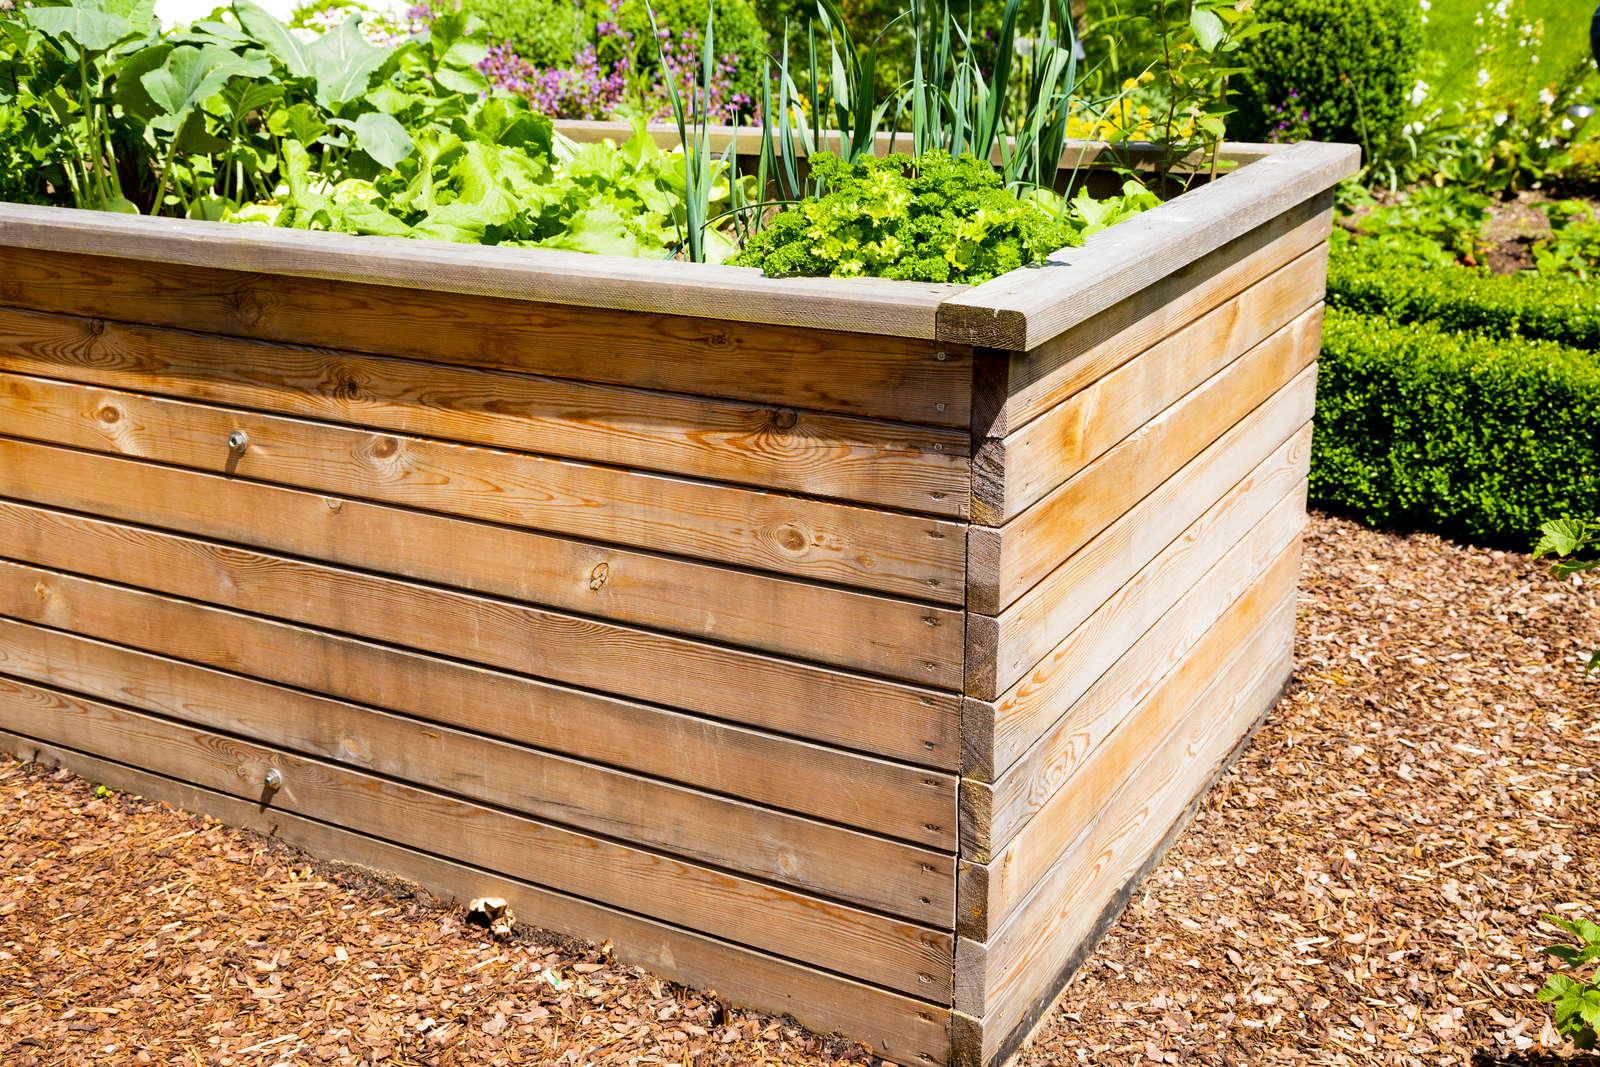 10 Hausmittel Gegen Schadlinge Im Garten Plantura